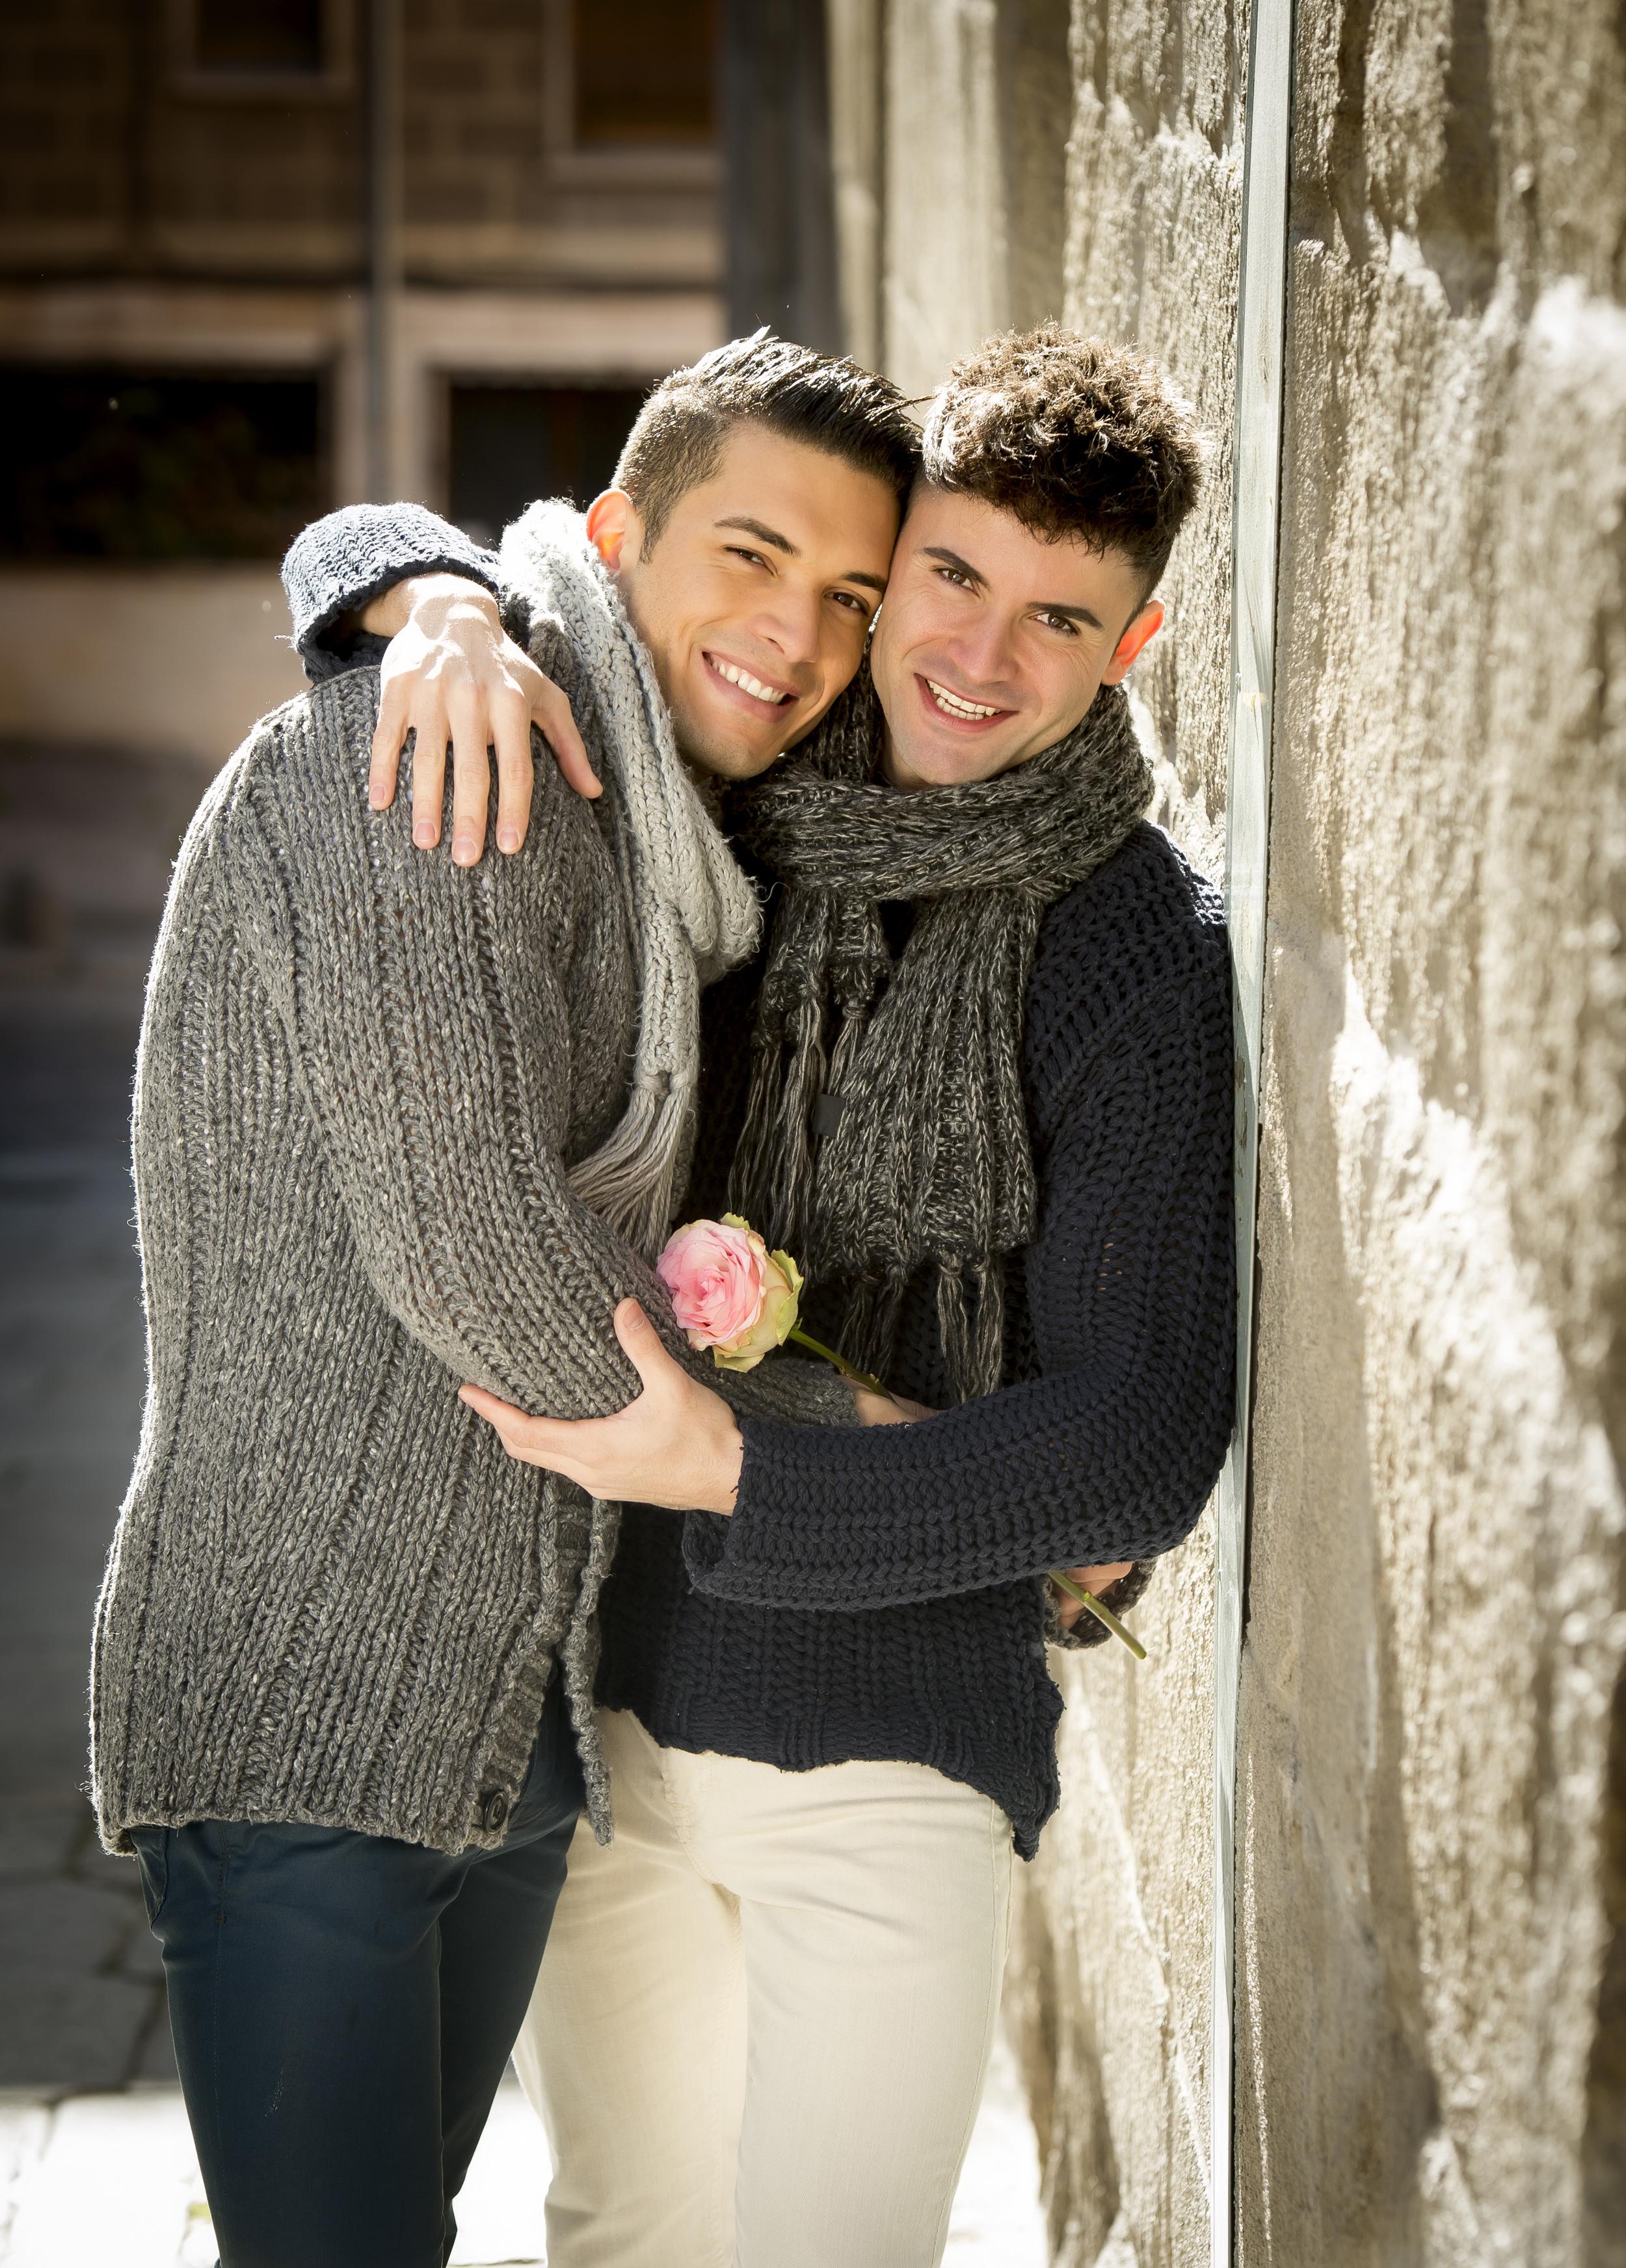 Nancy-Kerr-gay-men-couple-holding-rose-kissing-outdoors-valentines-day.jpg